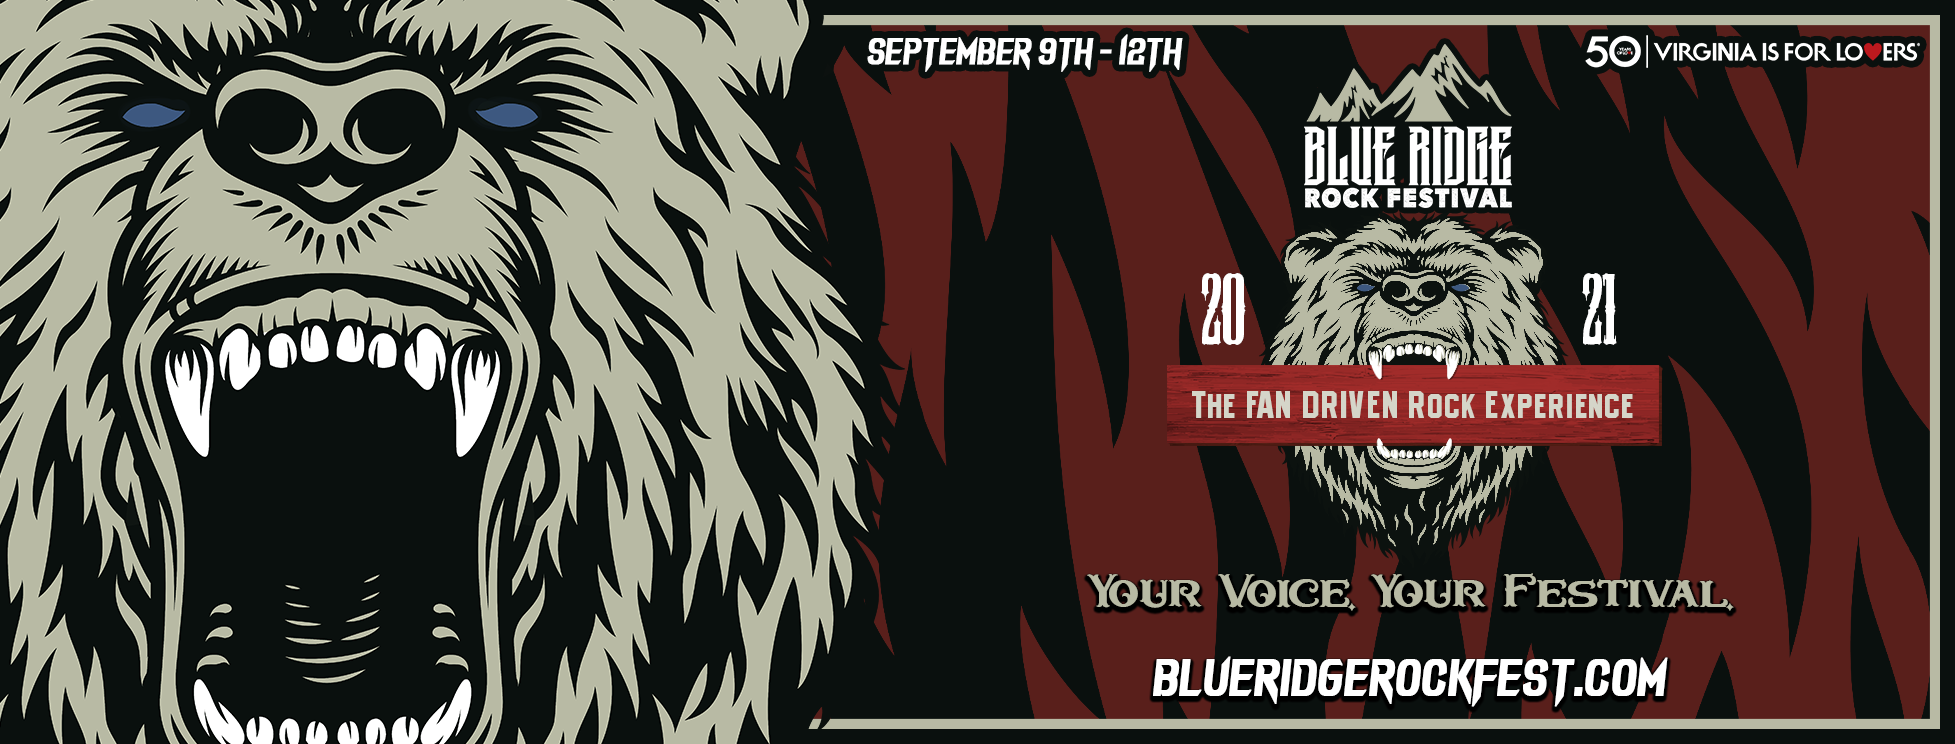 Blue Ridge Rock Festival 2021 Poster